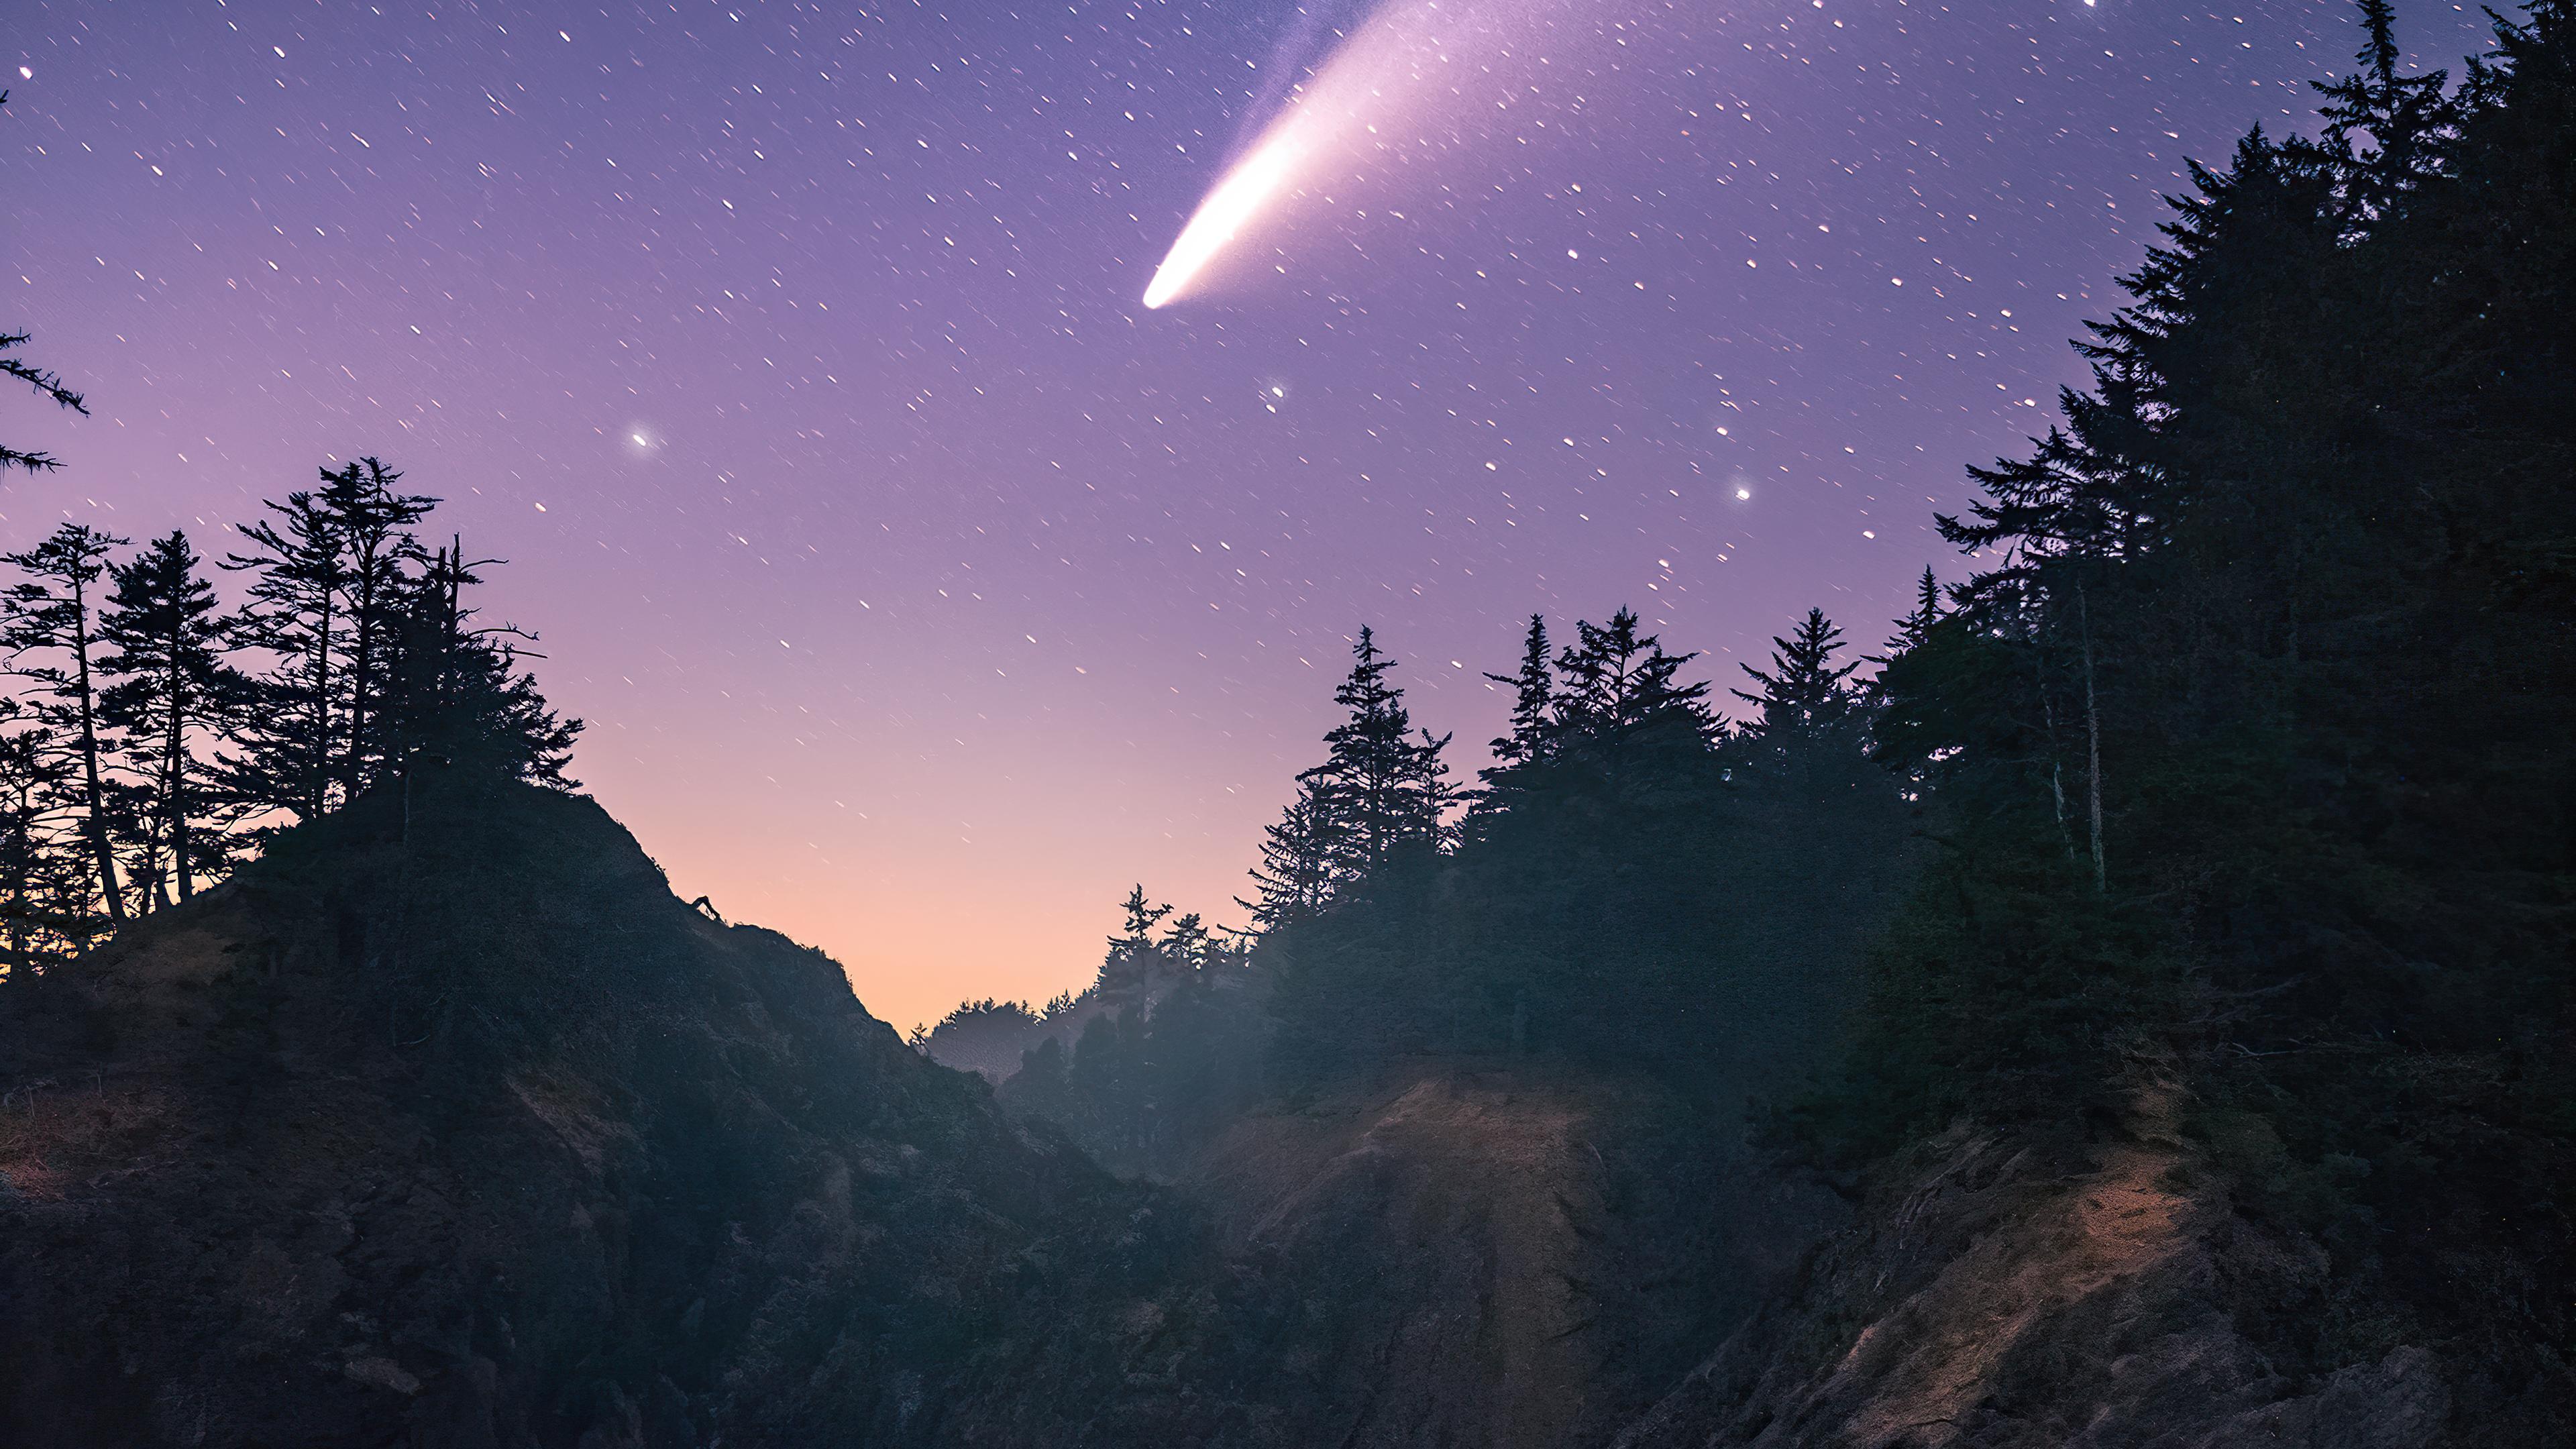 star shines bright on the oregon coast 4k 1602533775 - Star Shines Bright On The Oregon Coast 4k - Star Shines Bright On The Oregon Coast 4k wallpapers